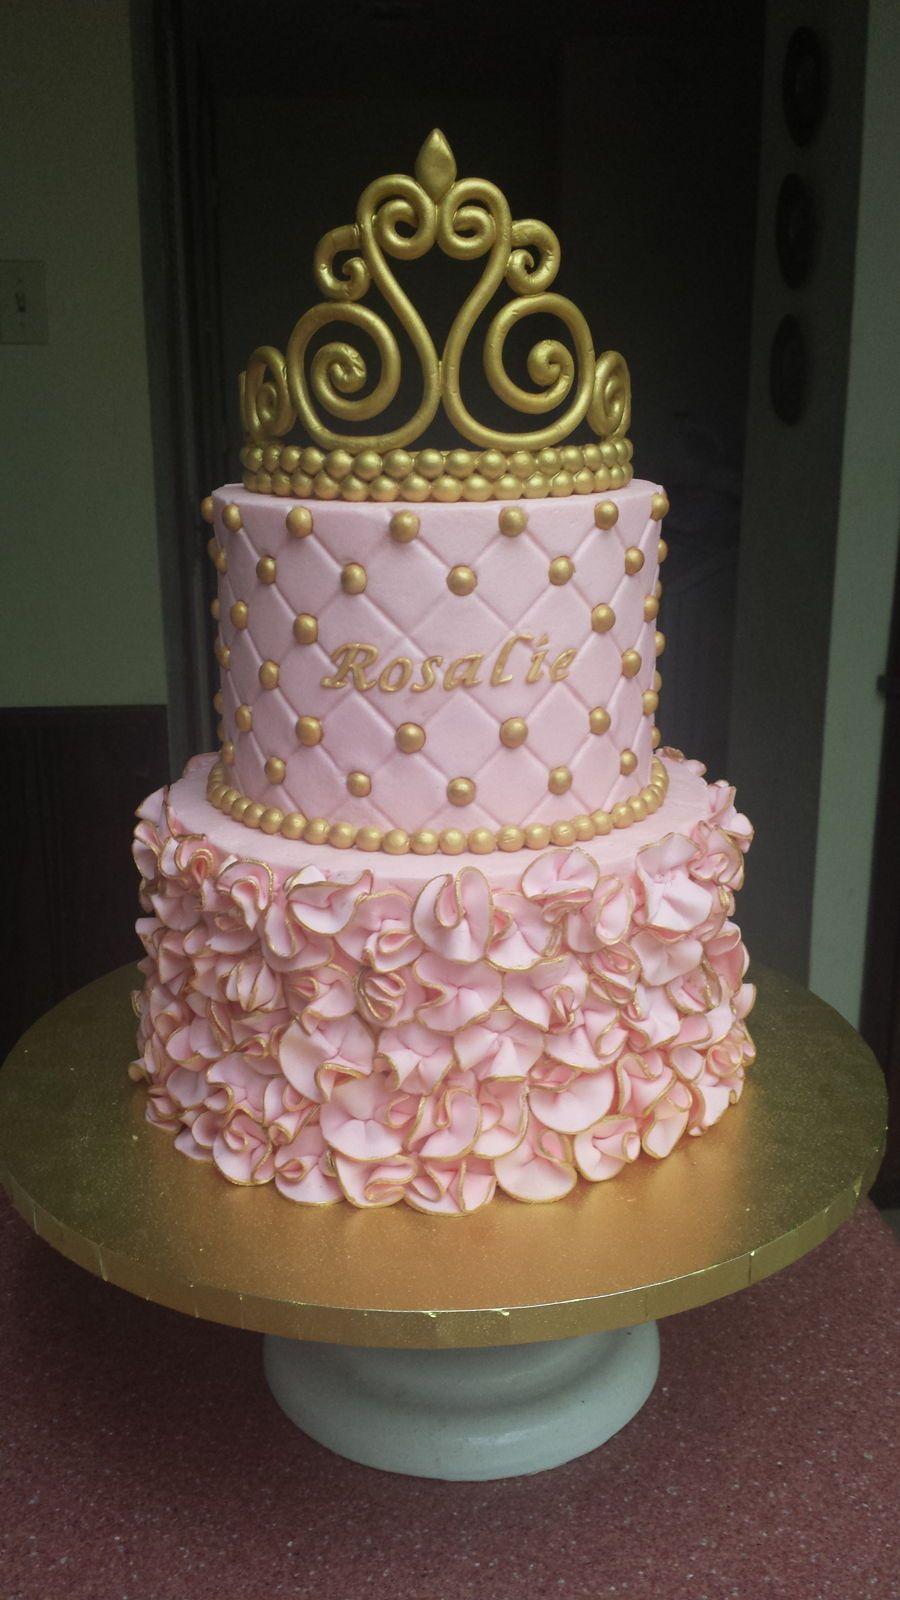 High Quality Little Princess Baby Shower Cake Buttercream Cake With Fondant Ruffles And  Gumpaste Tiara